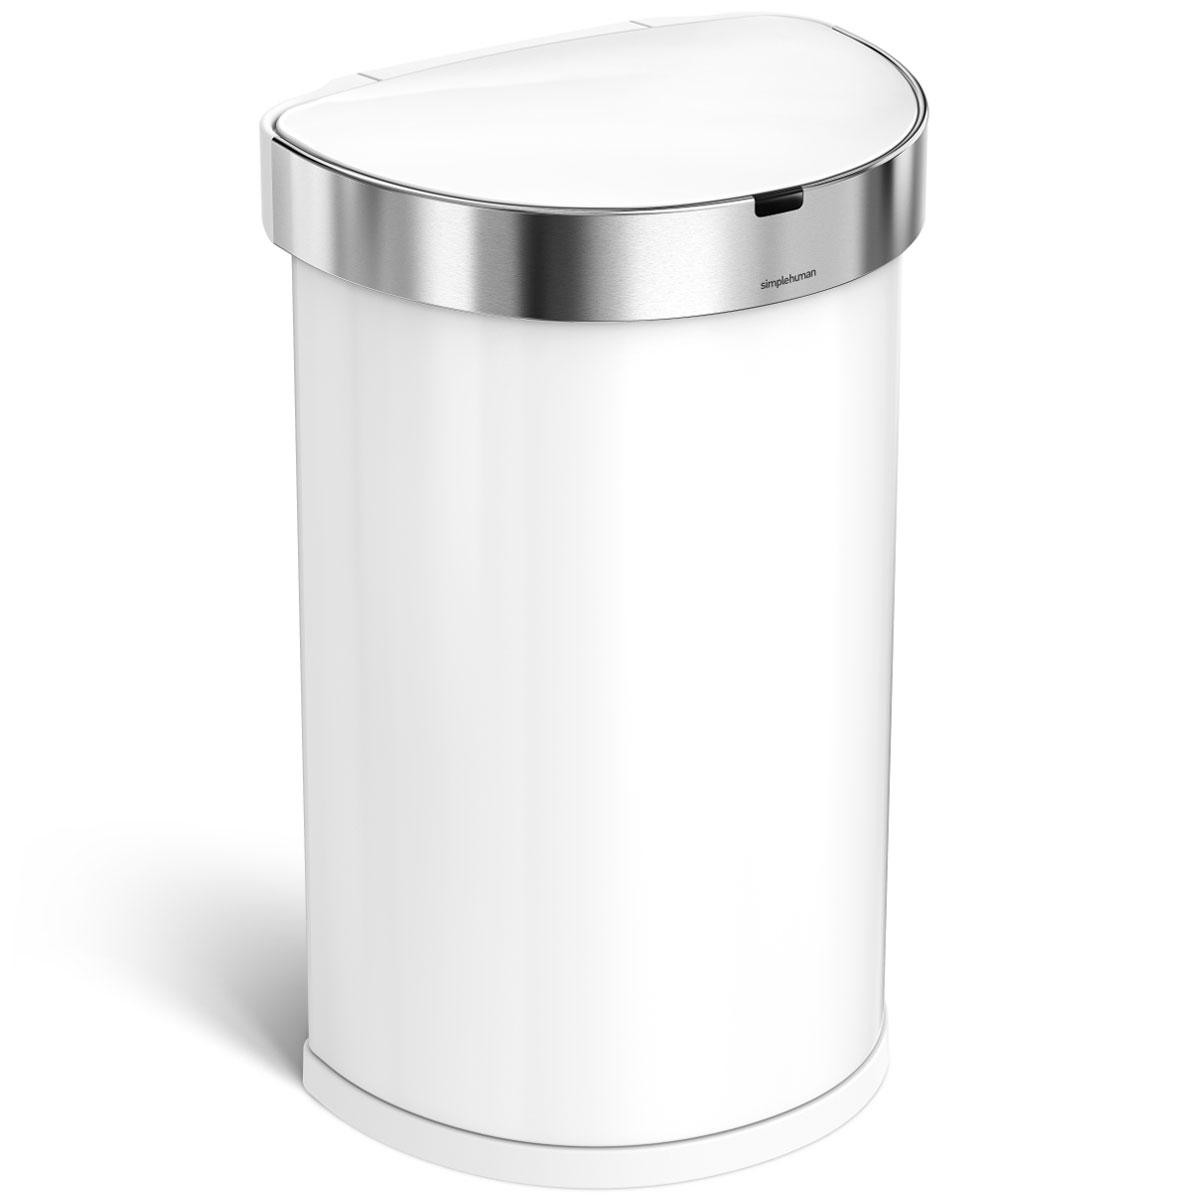 simplehuman ゴミ箱 センサーカン セミラウンド 45L ふた付き センサー式 フタ自動オープン ダストボックス ごみ箱 上質で上品でオシャレなゴミ箱です! シンプルヒューマン 正規品 メーカー保証付き ゴミ箱 45リットル ST2018 ホワイト